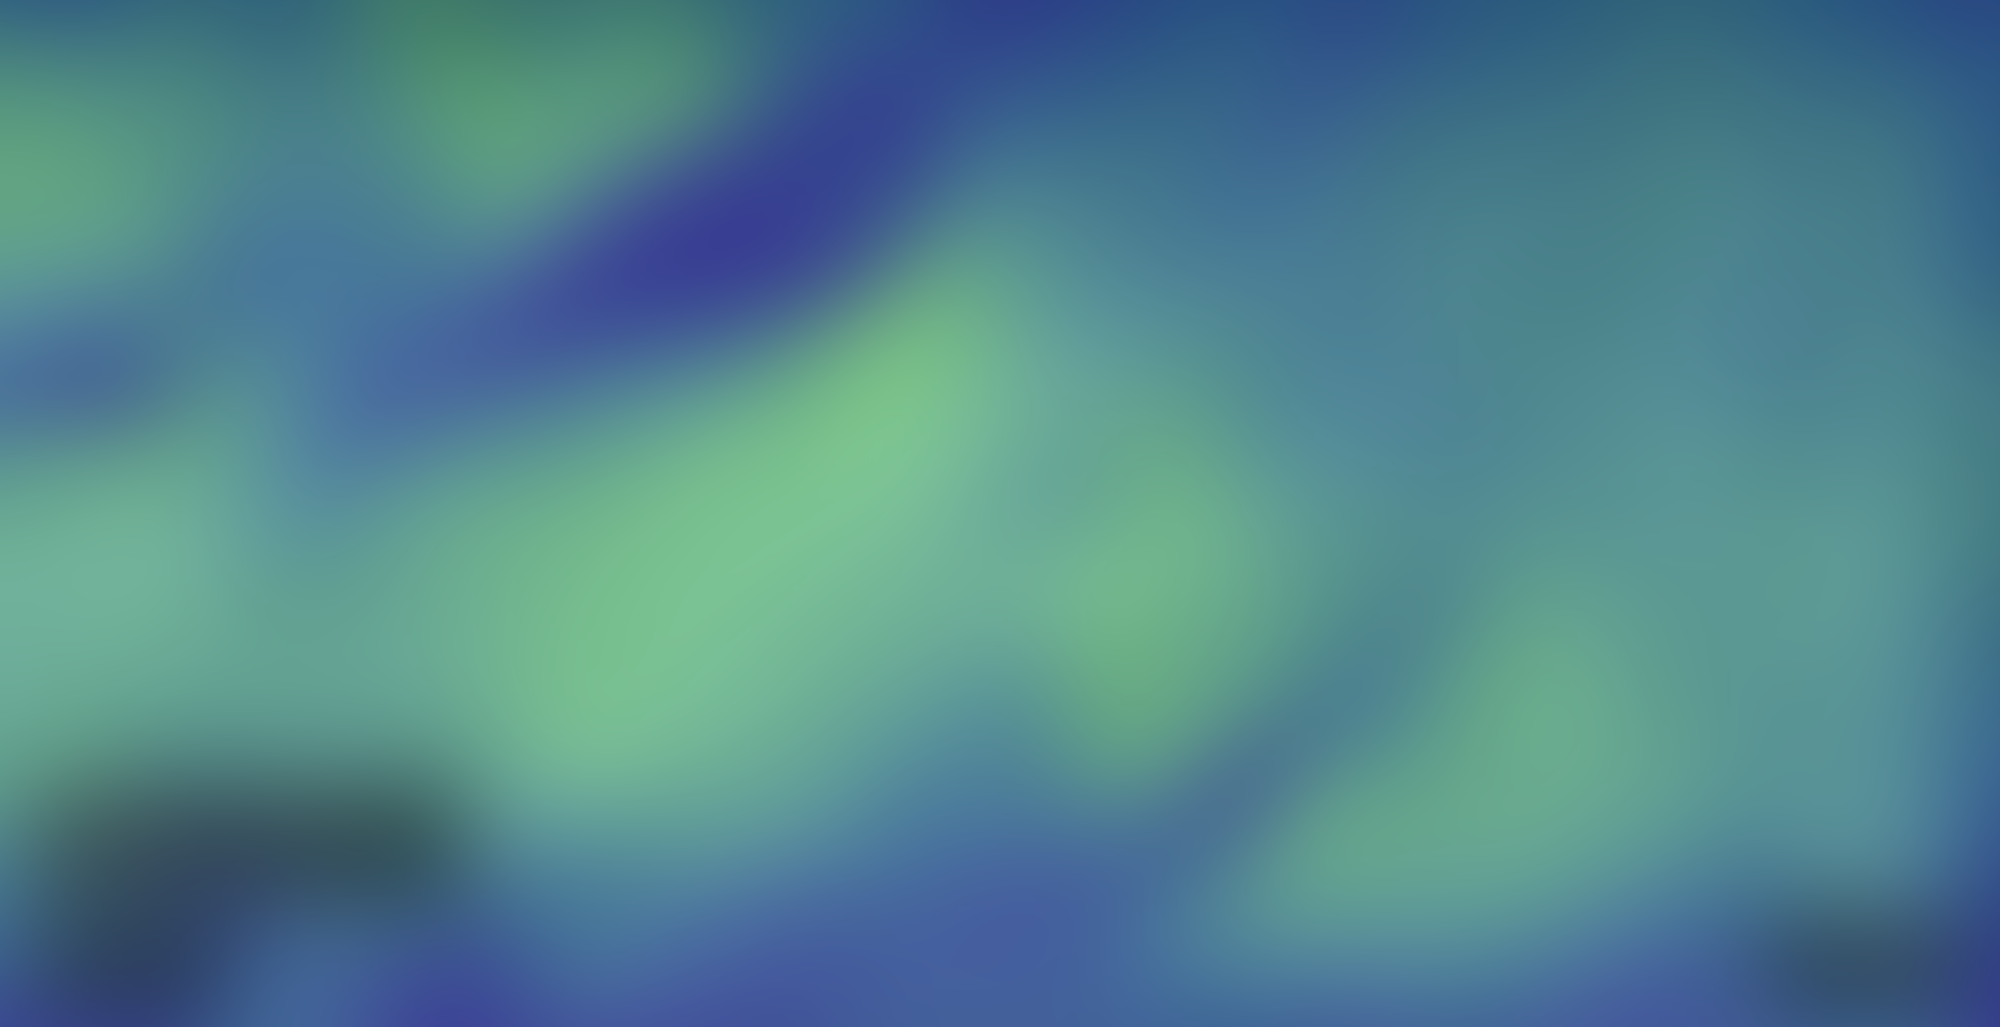 Screenshot 2020 02 11 at 10 56 55 autocompressfitresizeixlibphp 1 1 0max h2000max w3 D2000q80sb65b8379f281a2b8072c14d993ebd729